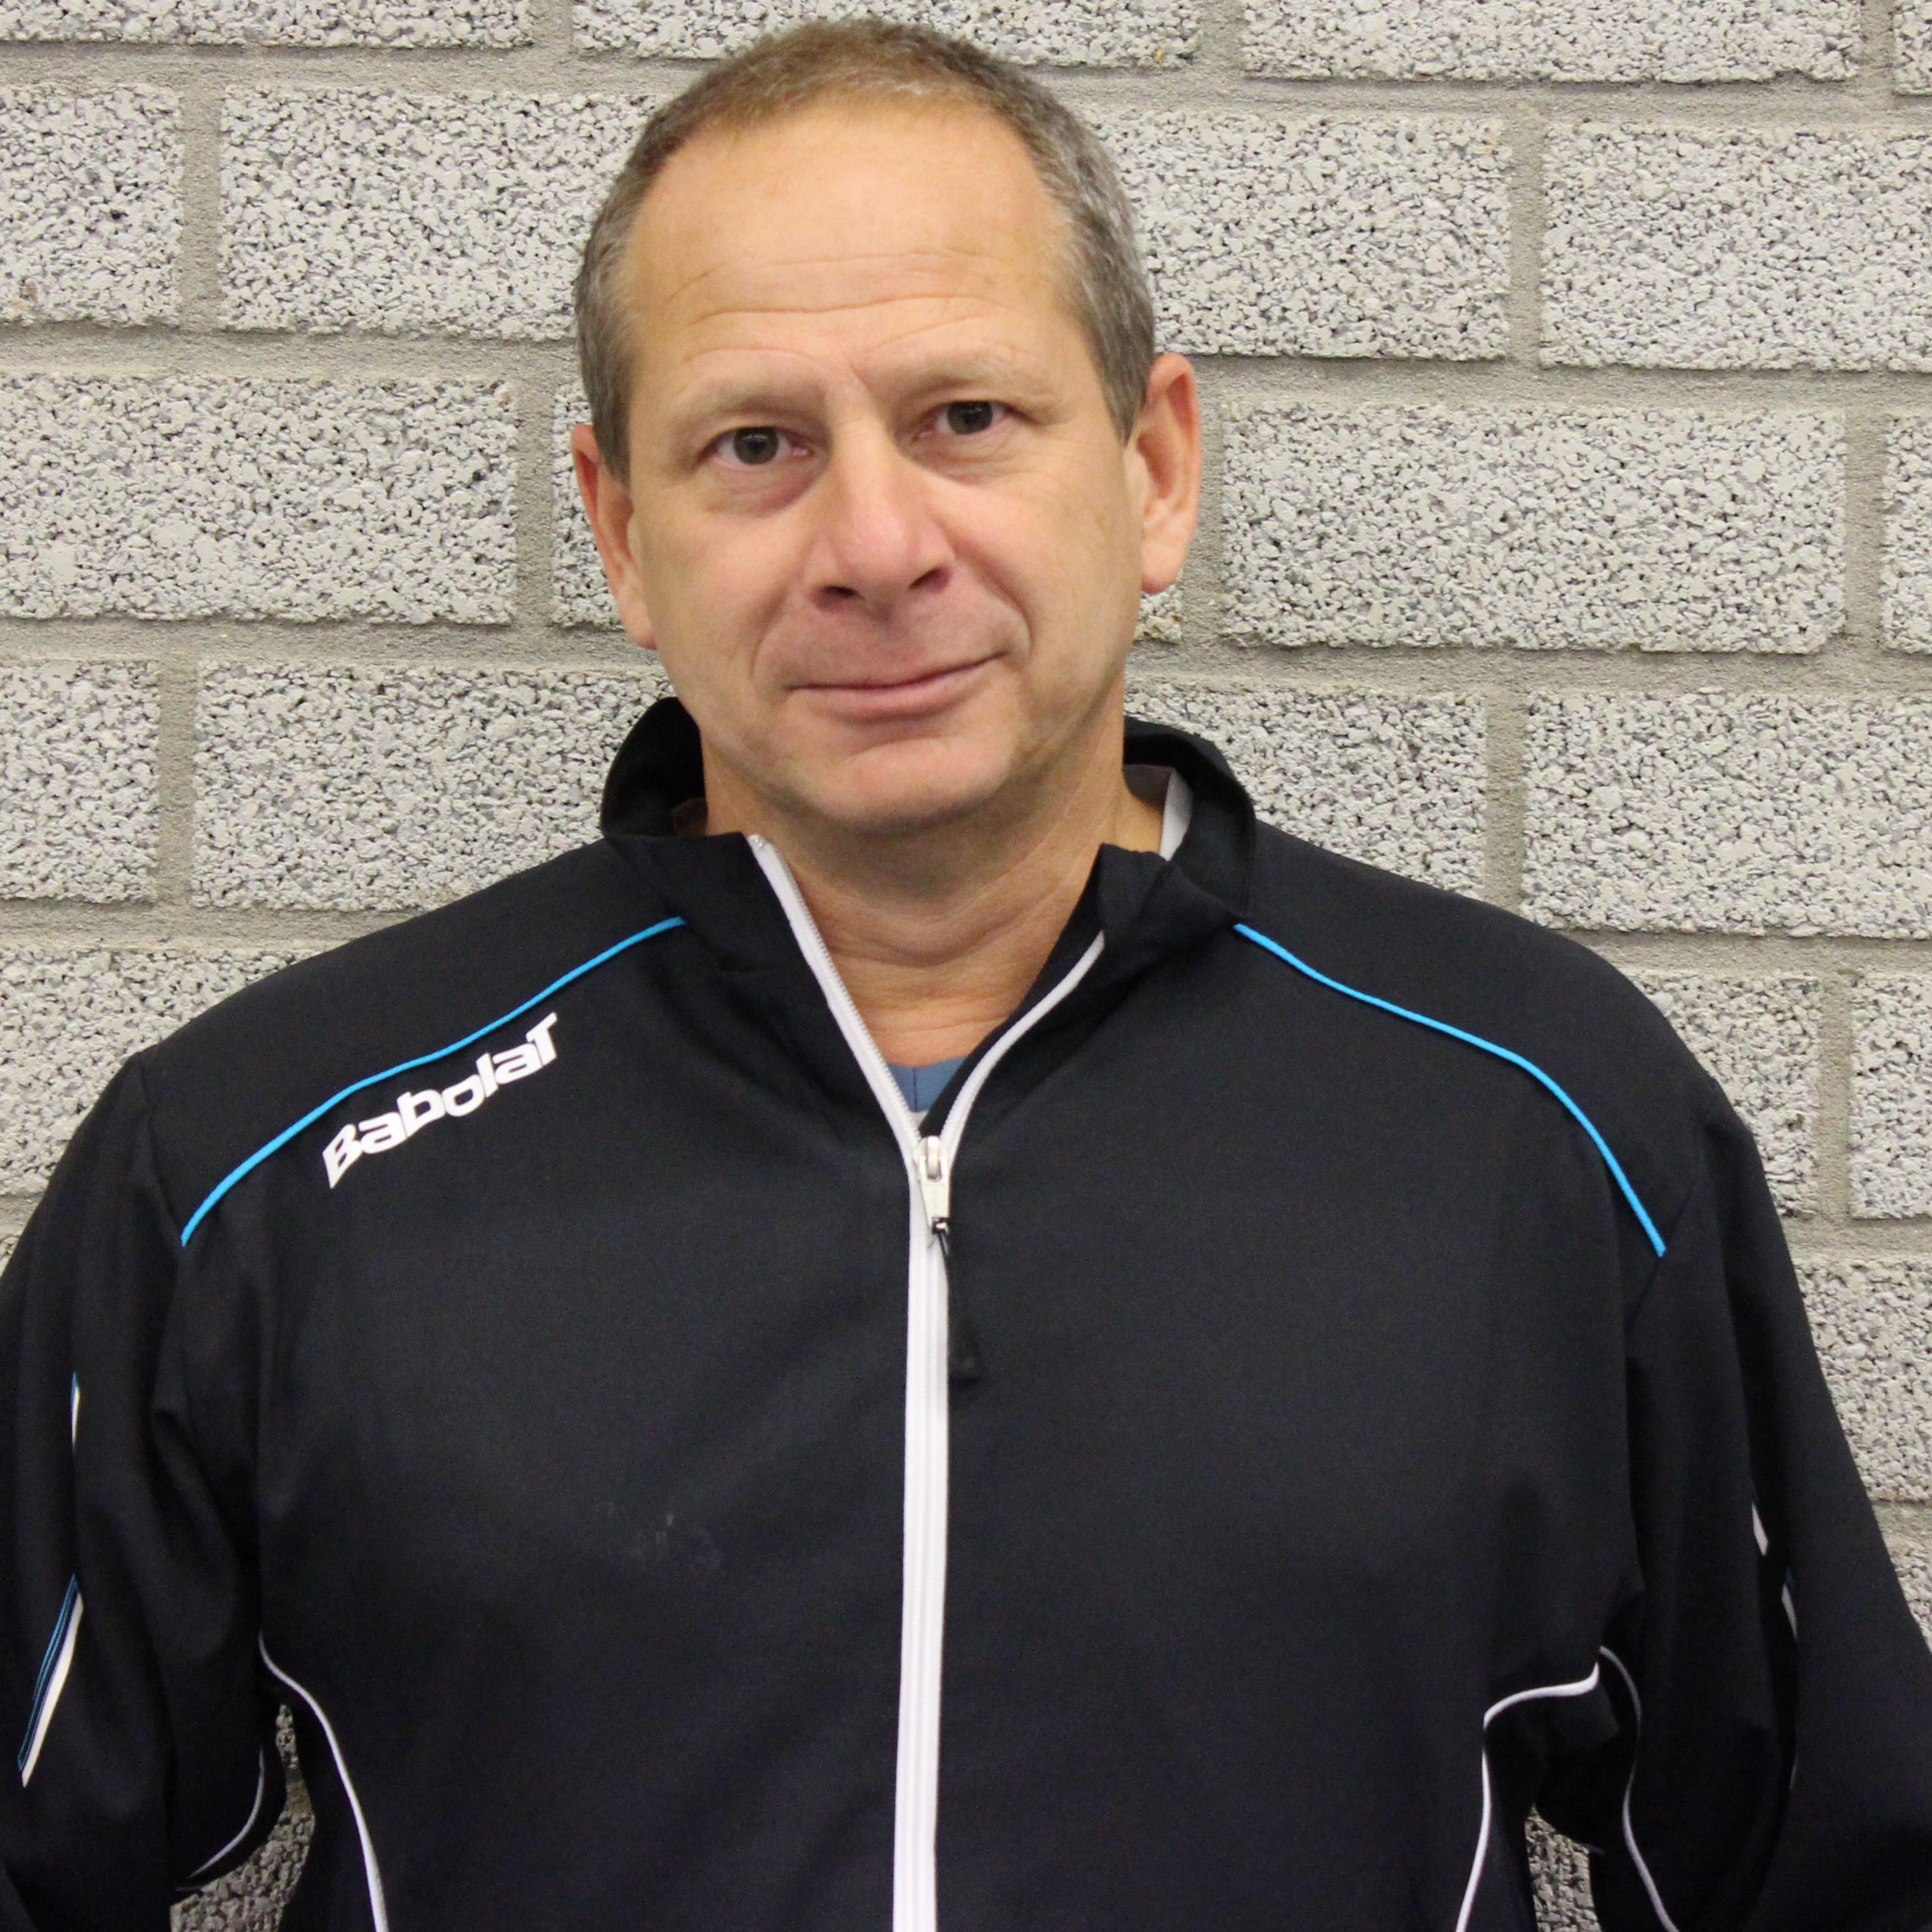 Frank Kneefel